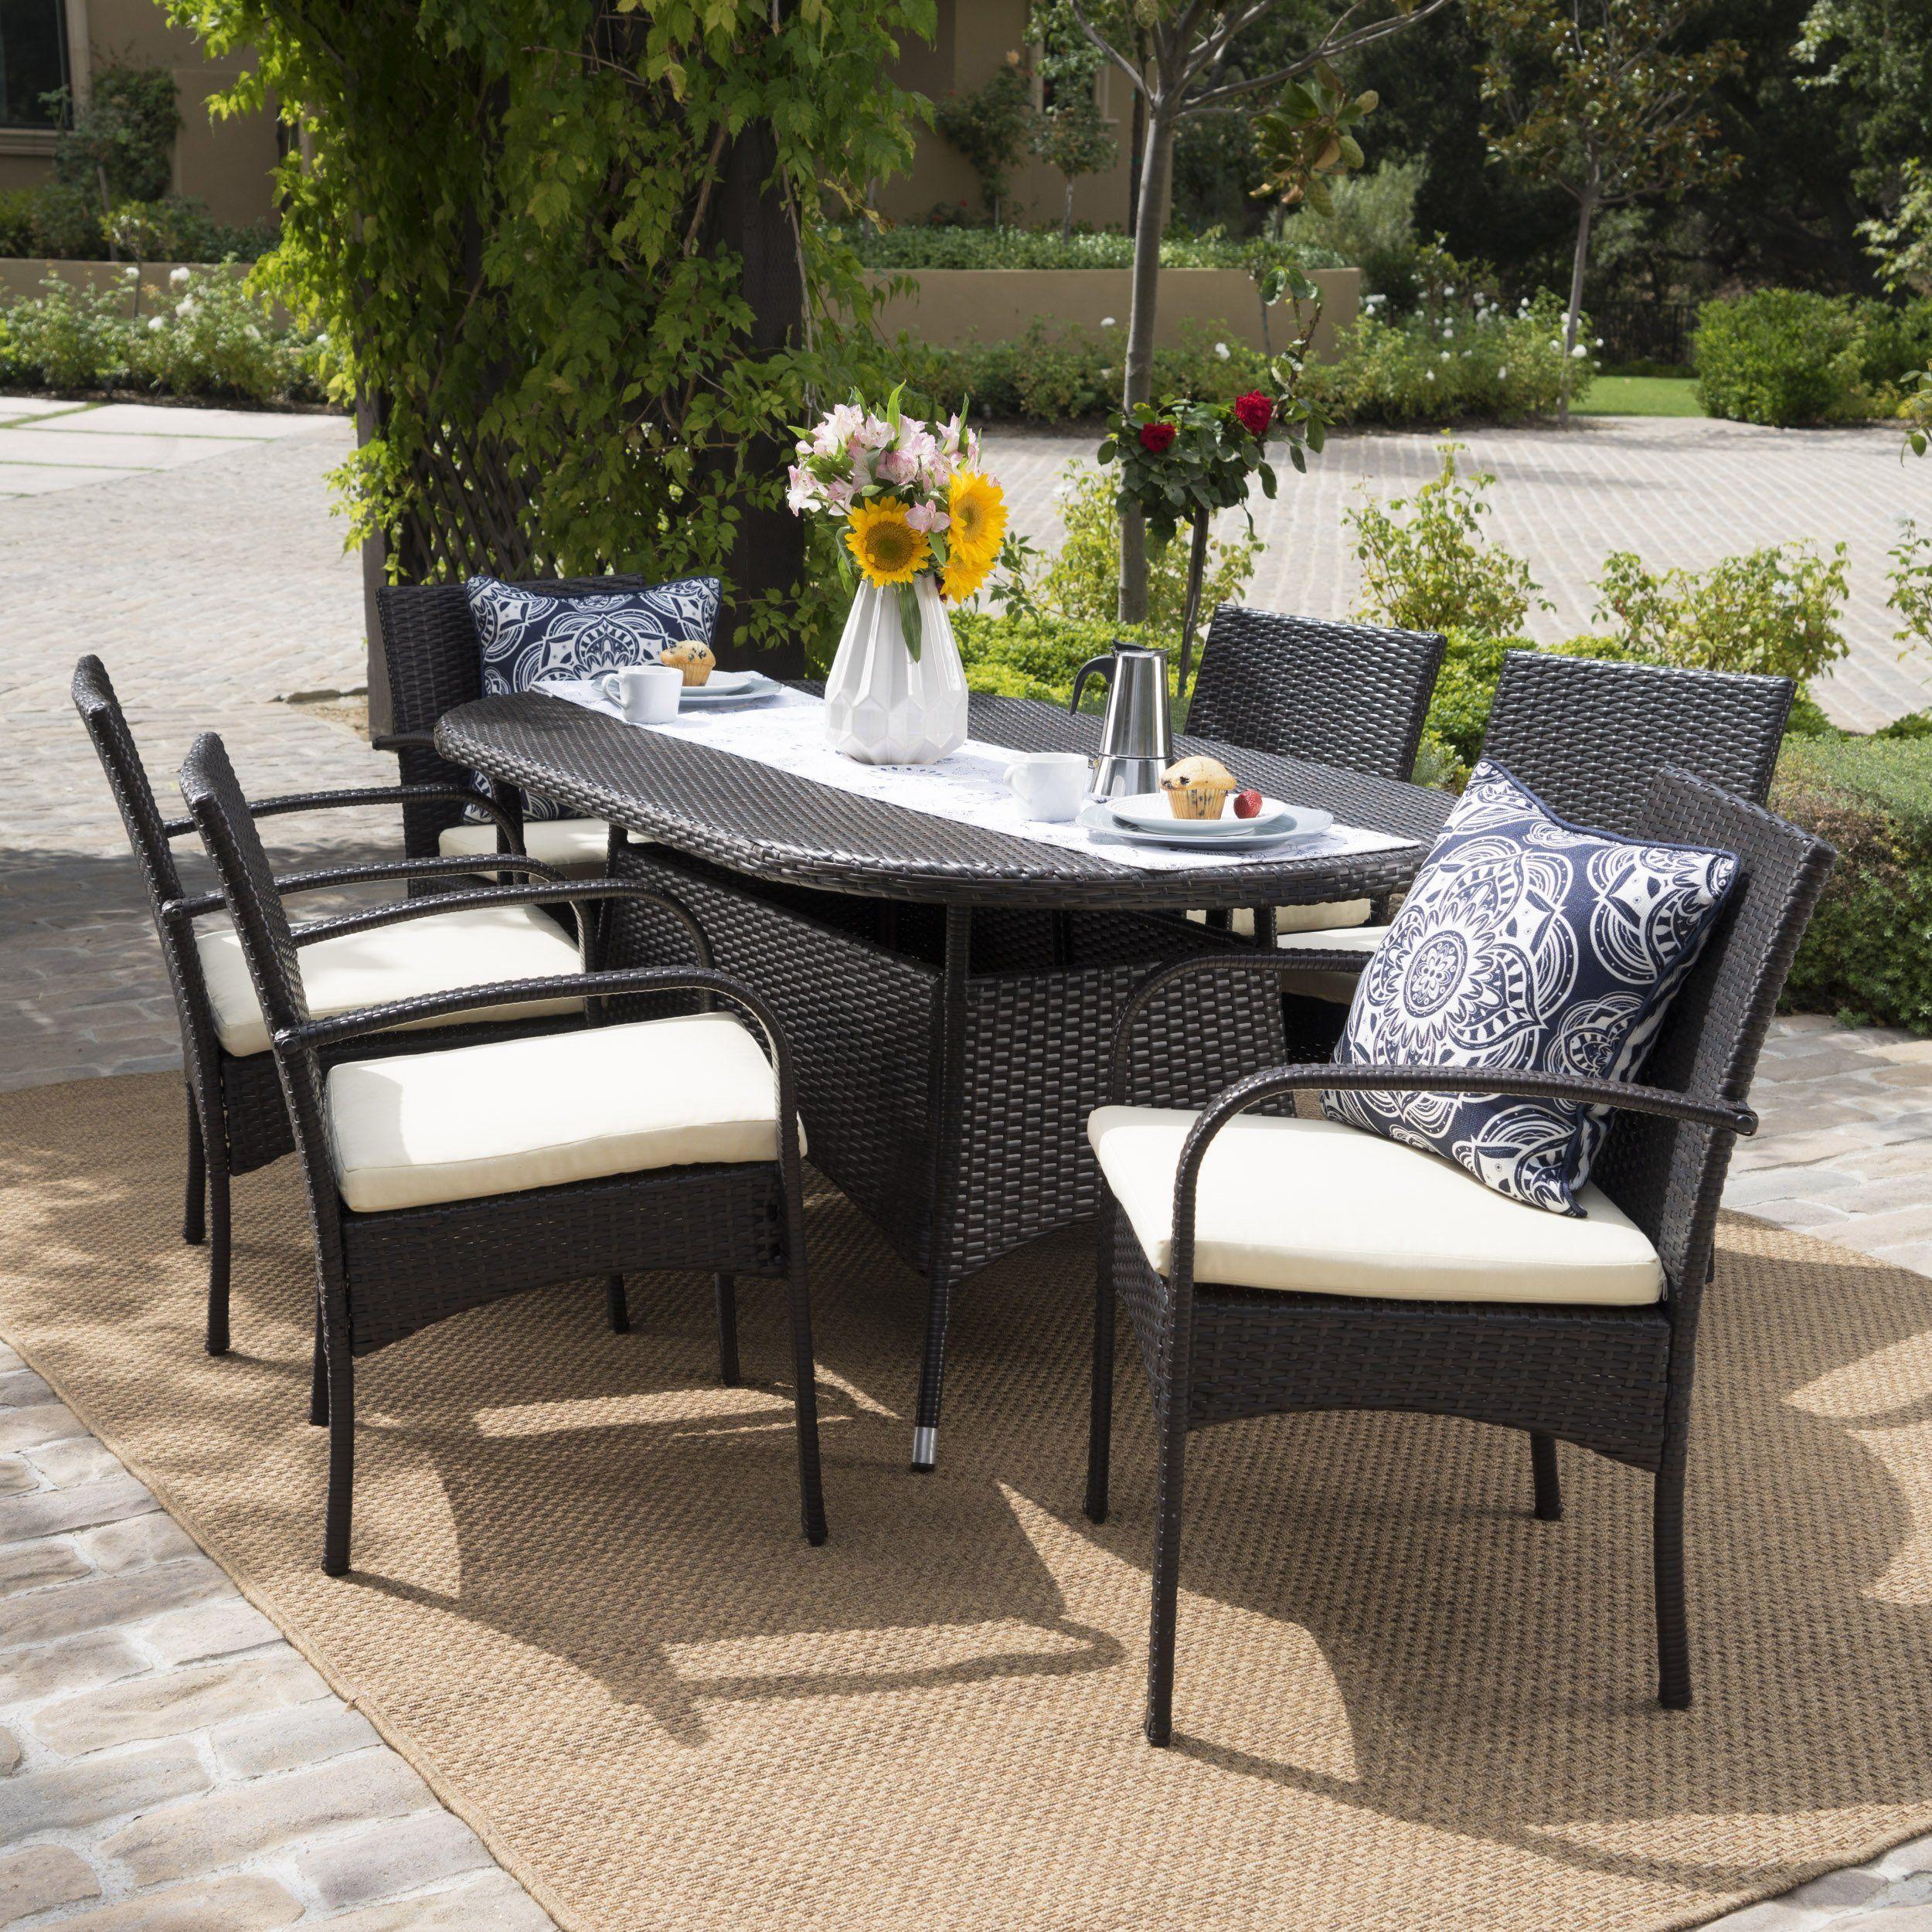 Carmela Outdoor 7pc Multibrown PE Wicker Long Dining Set